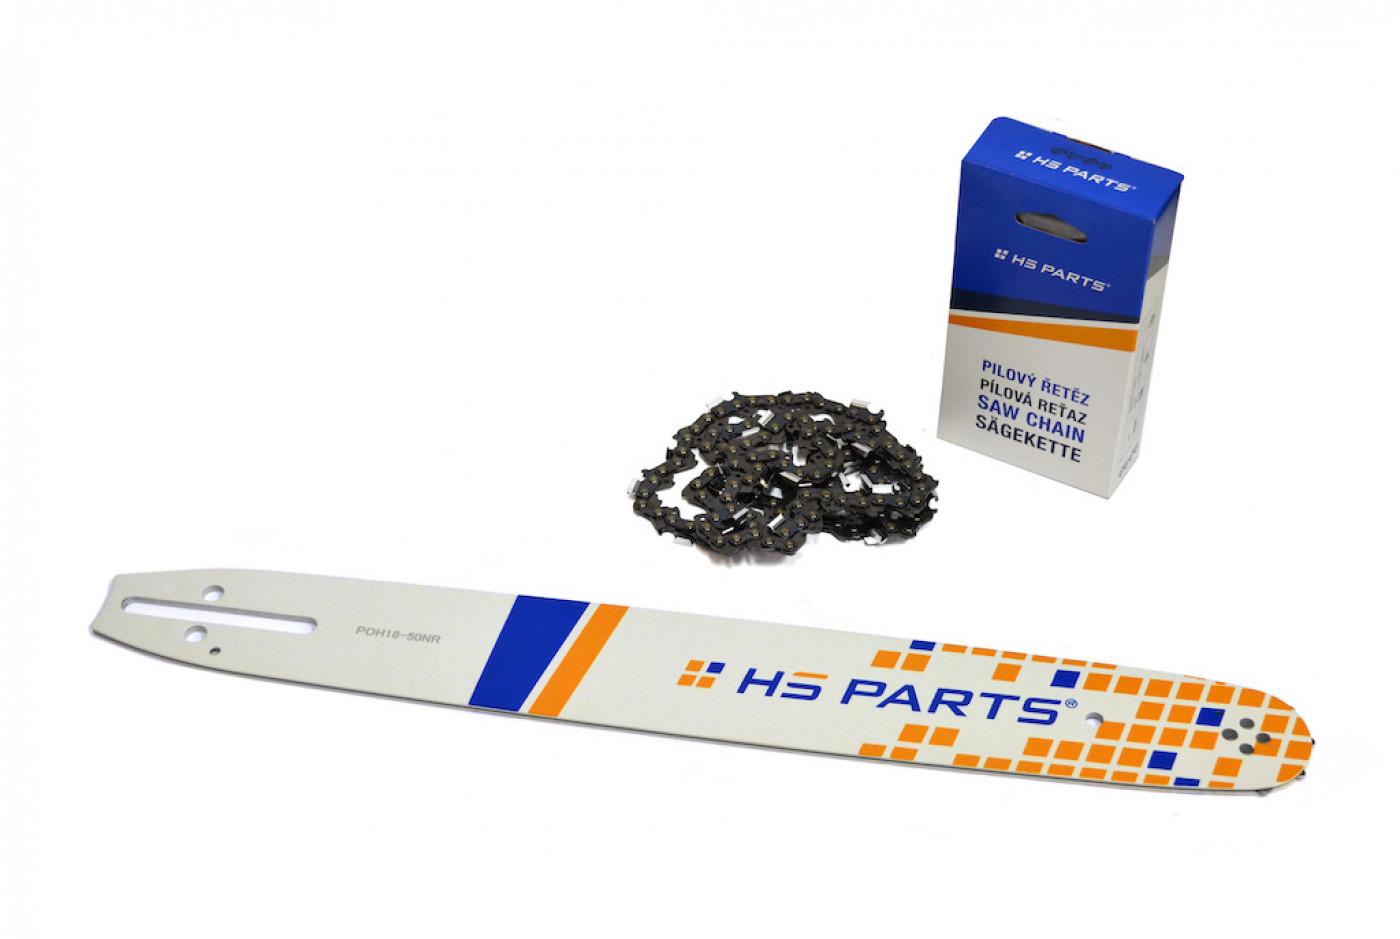 Lišta 40cm + reťaz 56 čl. 3 8 1,3mm pre Partner 350 351 370 390 420